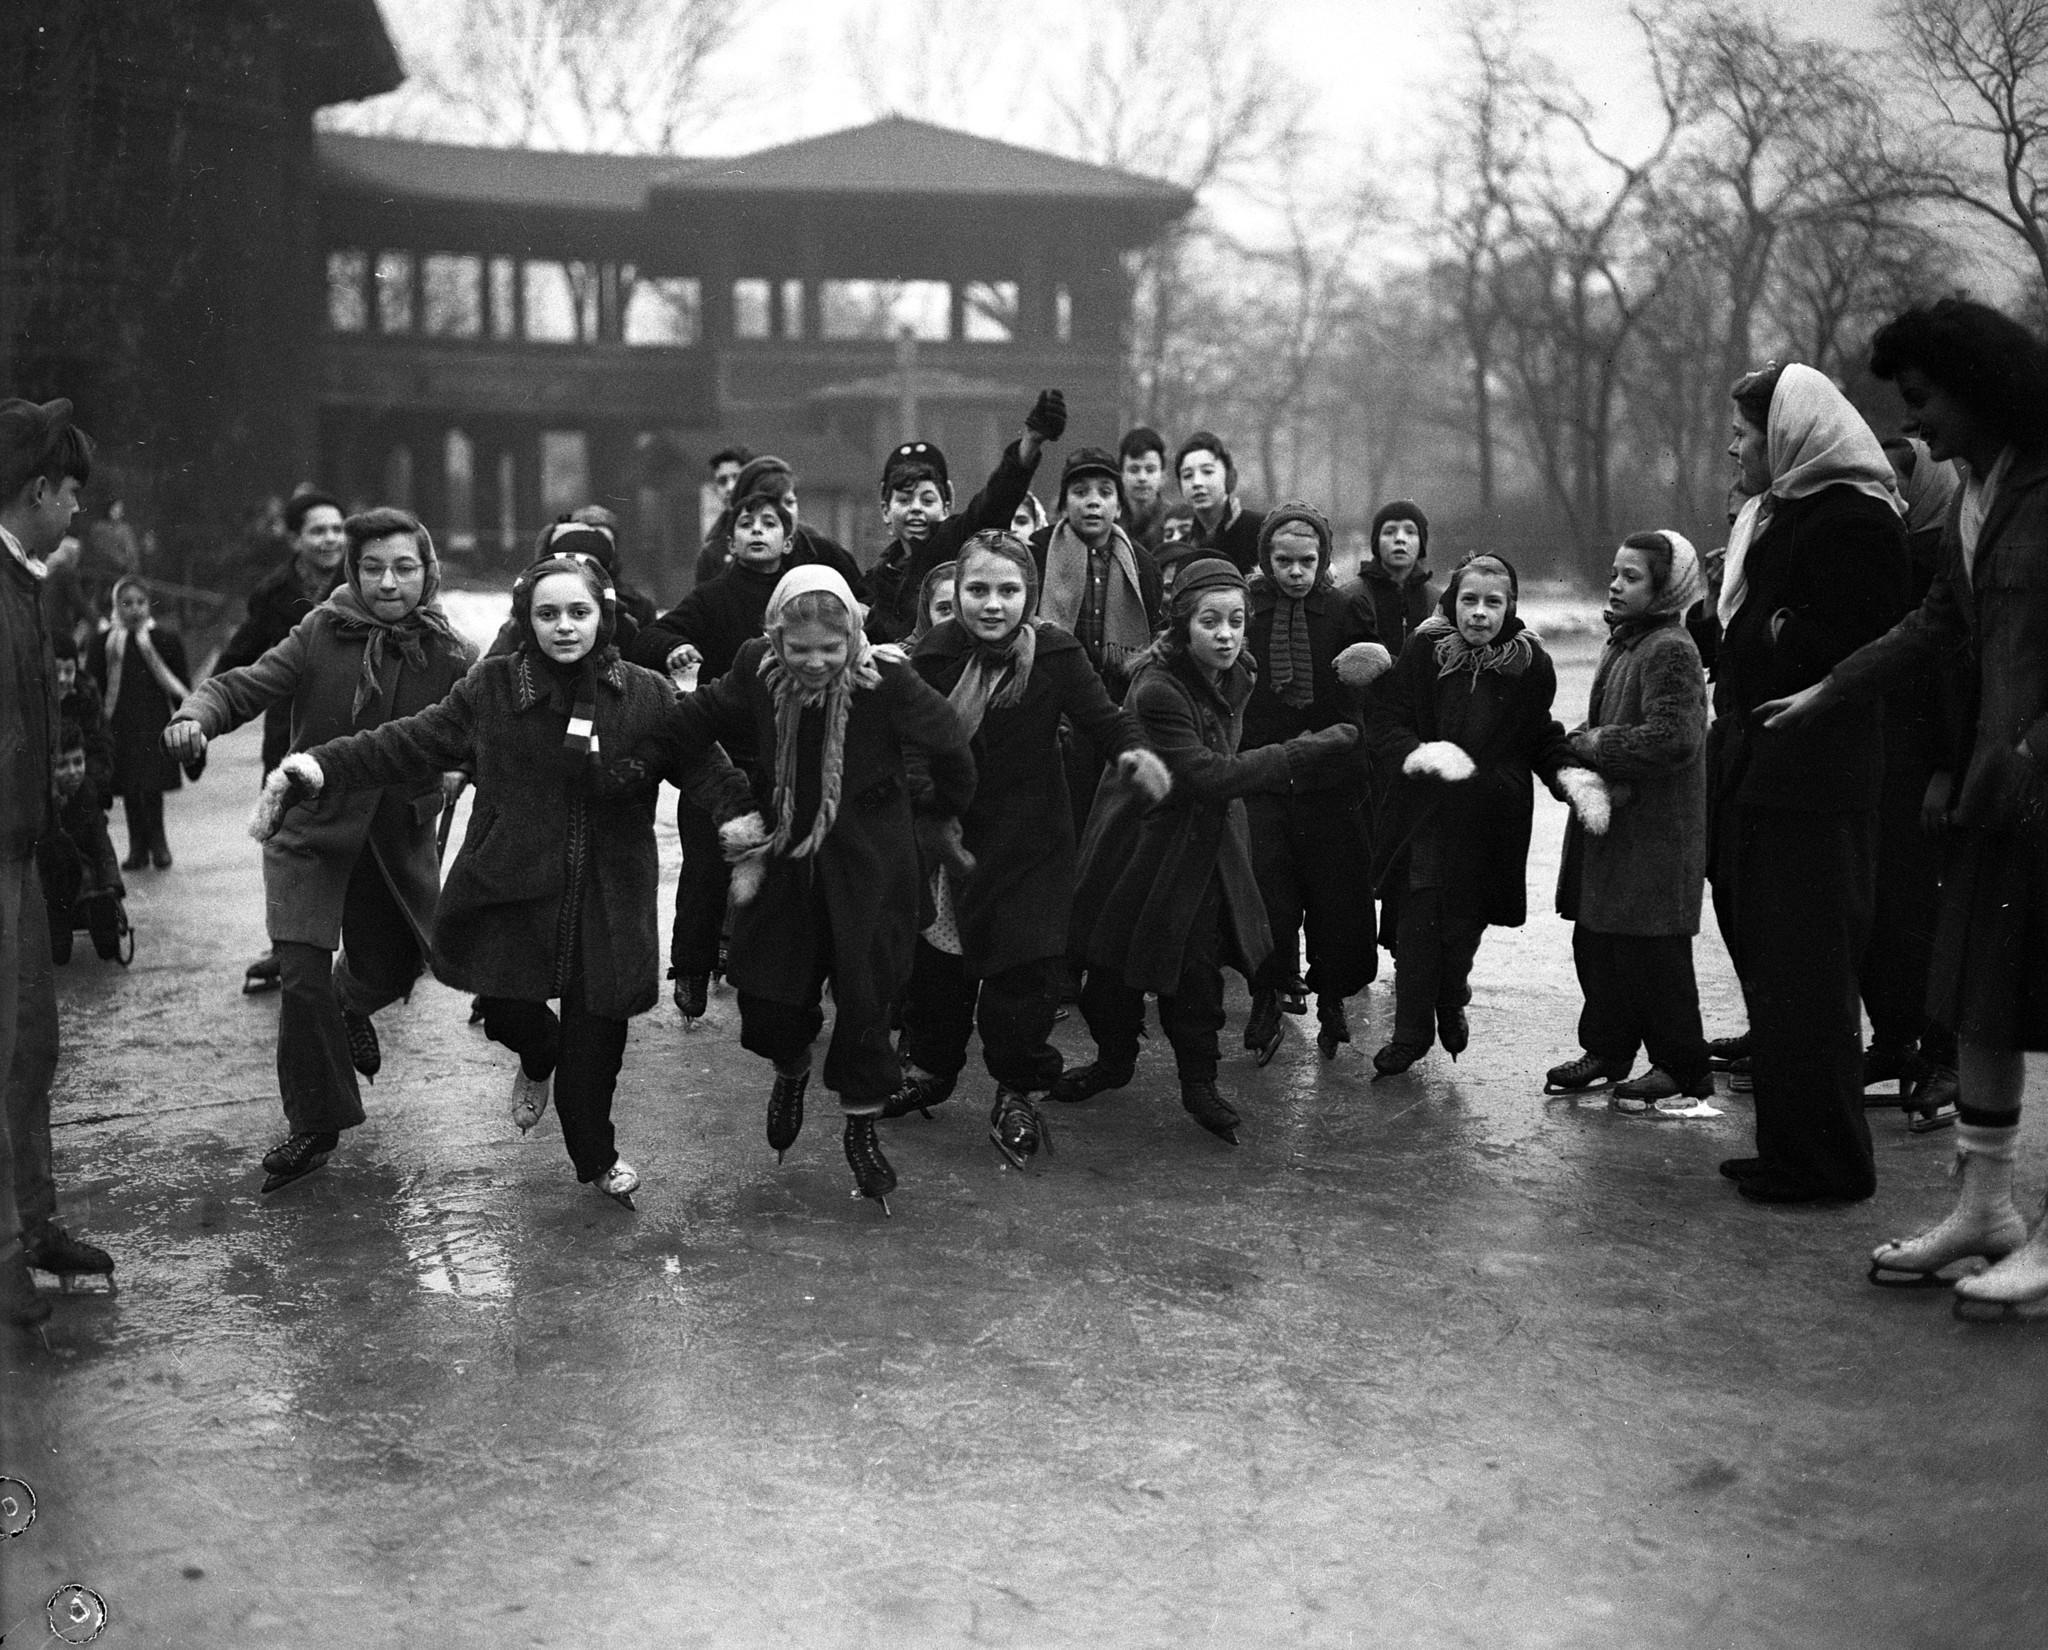 Vintage Ice Skating Chicago Tribune